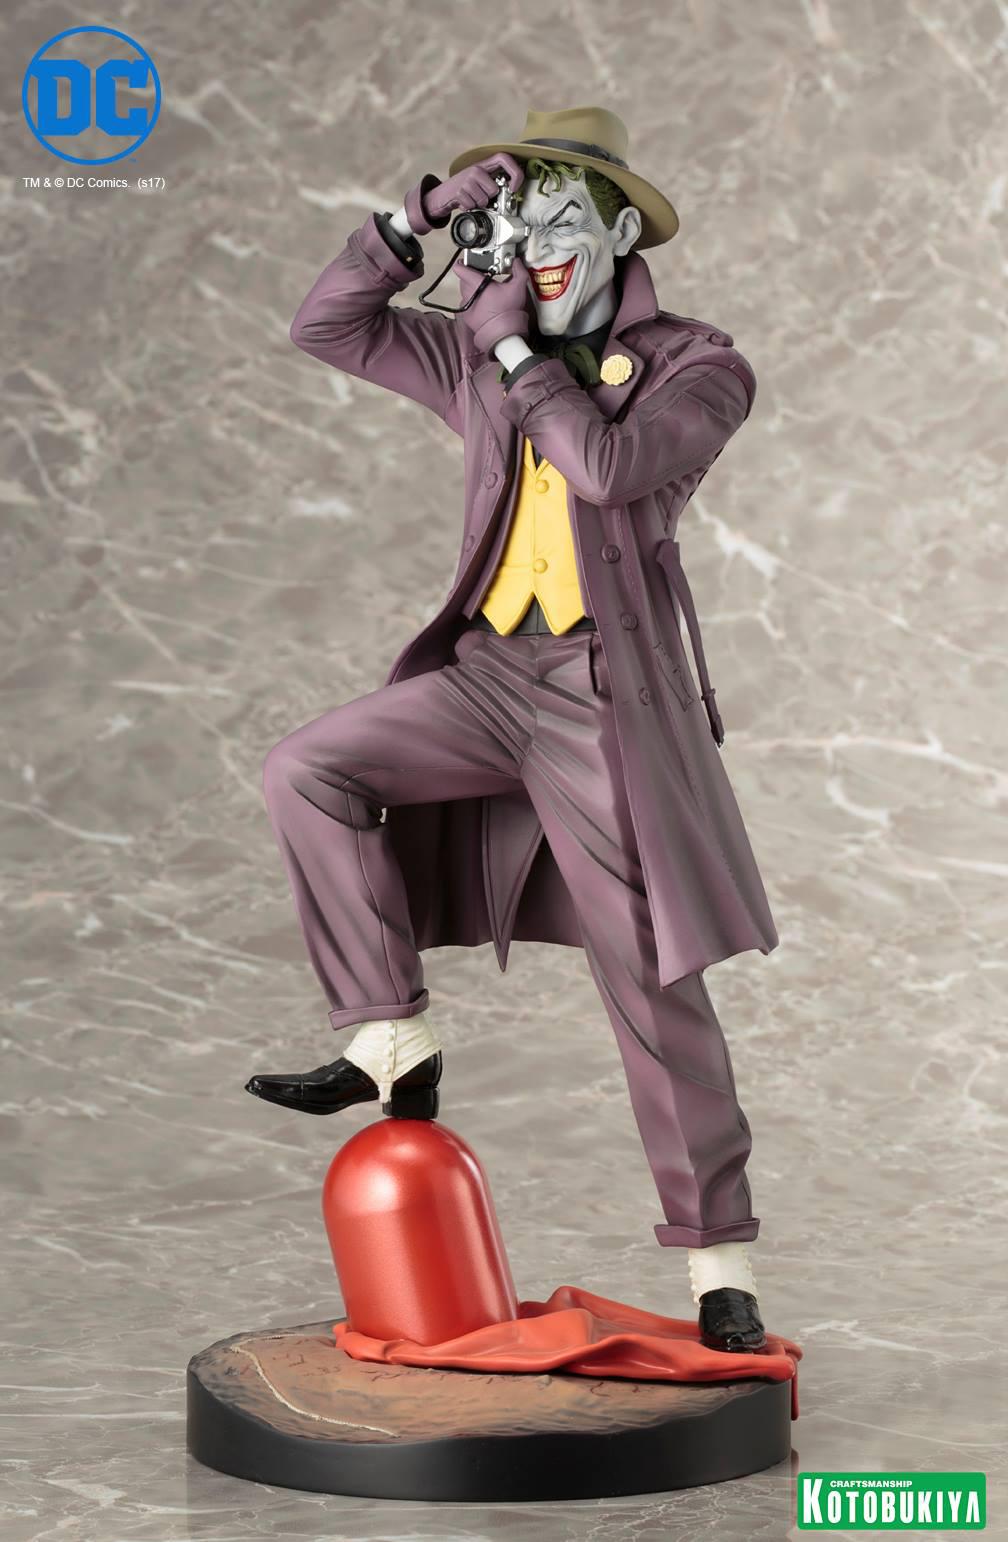 kotobukiya-joker-the-killing-joke-statue-1